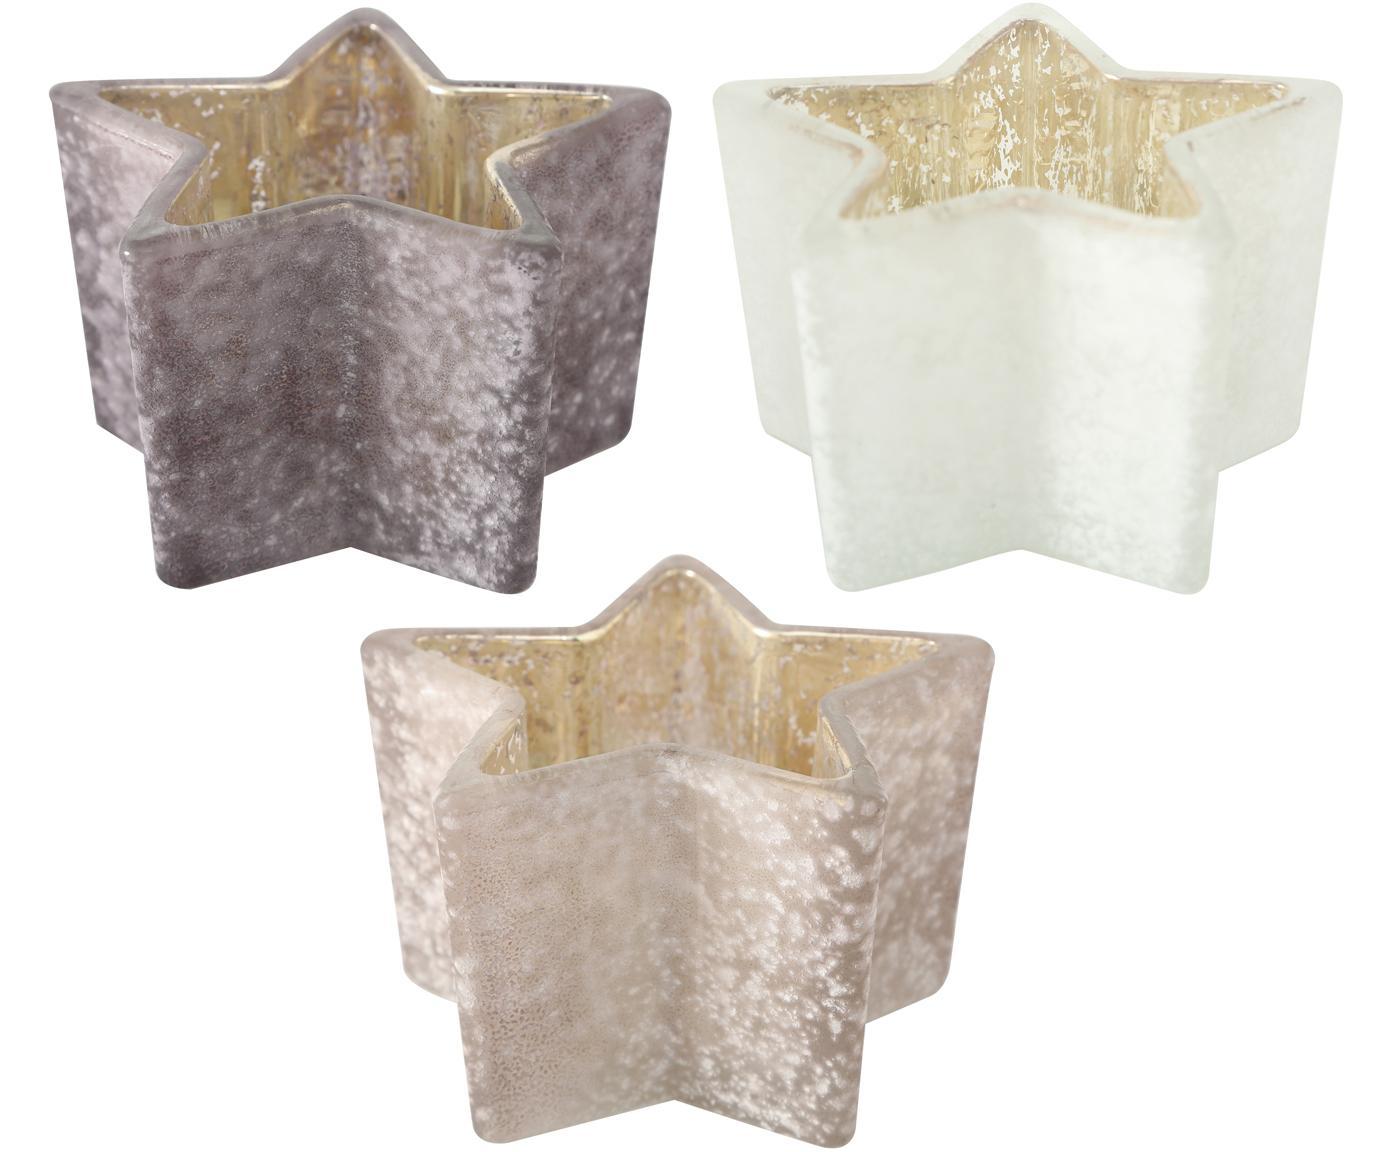 Teelichthalter-Set Stern, 3-tlg., Glas, lackiert, Grau, Ø 10 x 7 cm